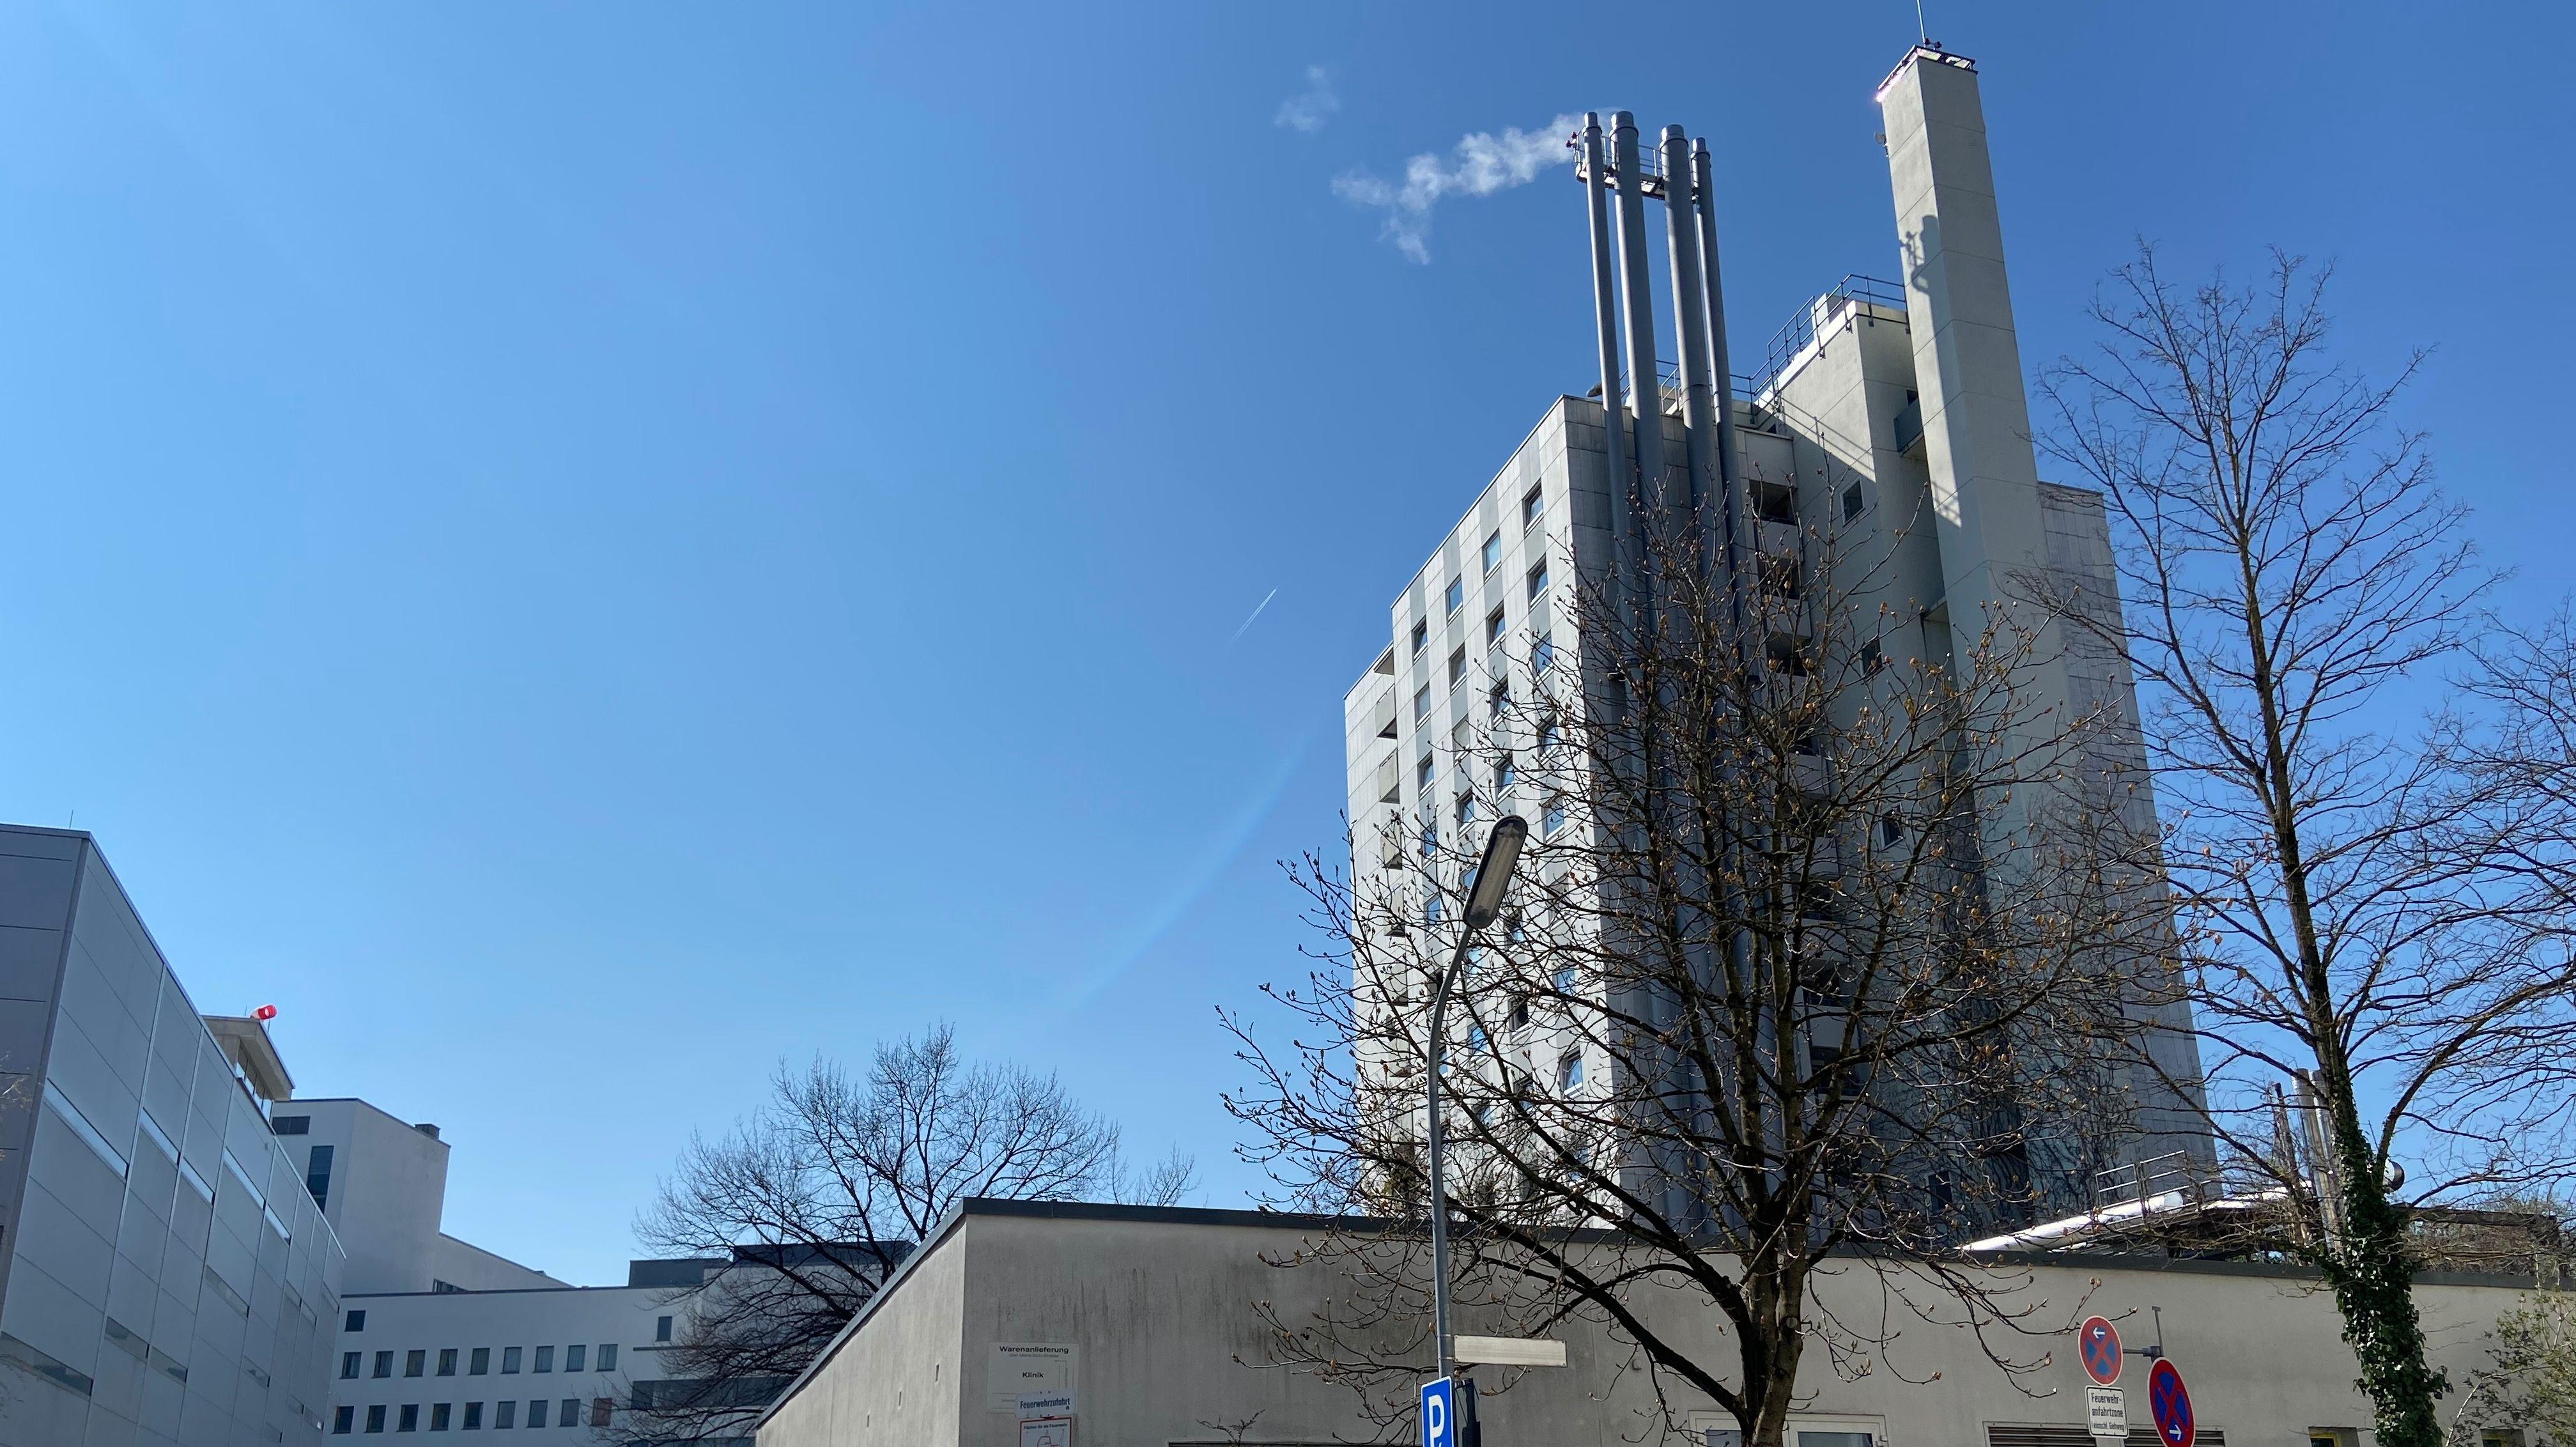 Helios Klinik München